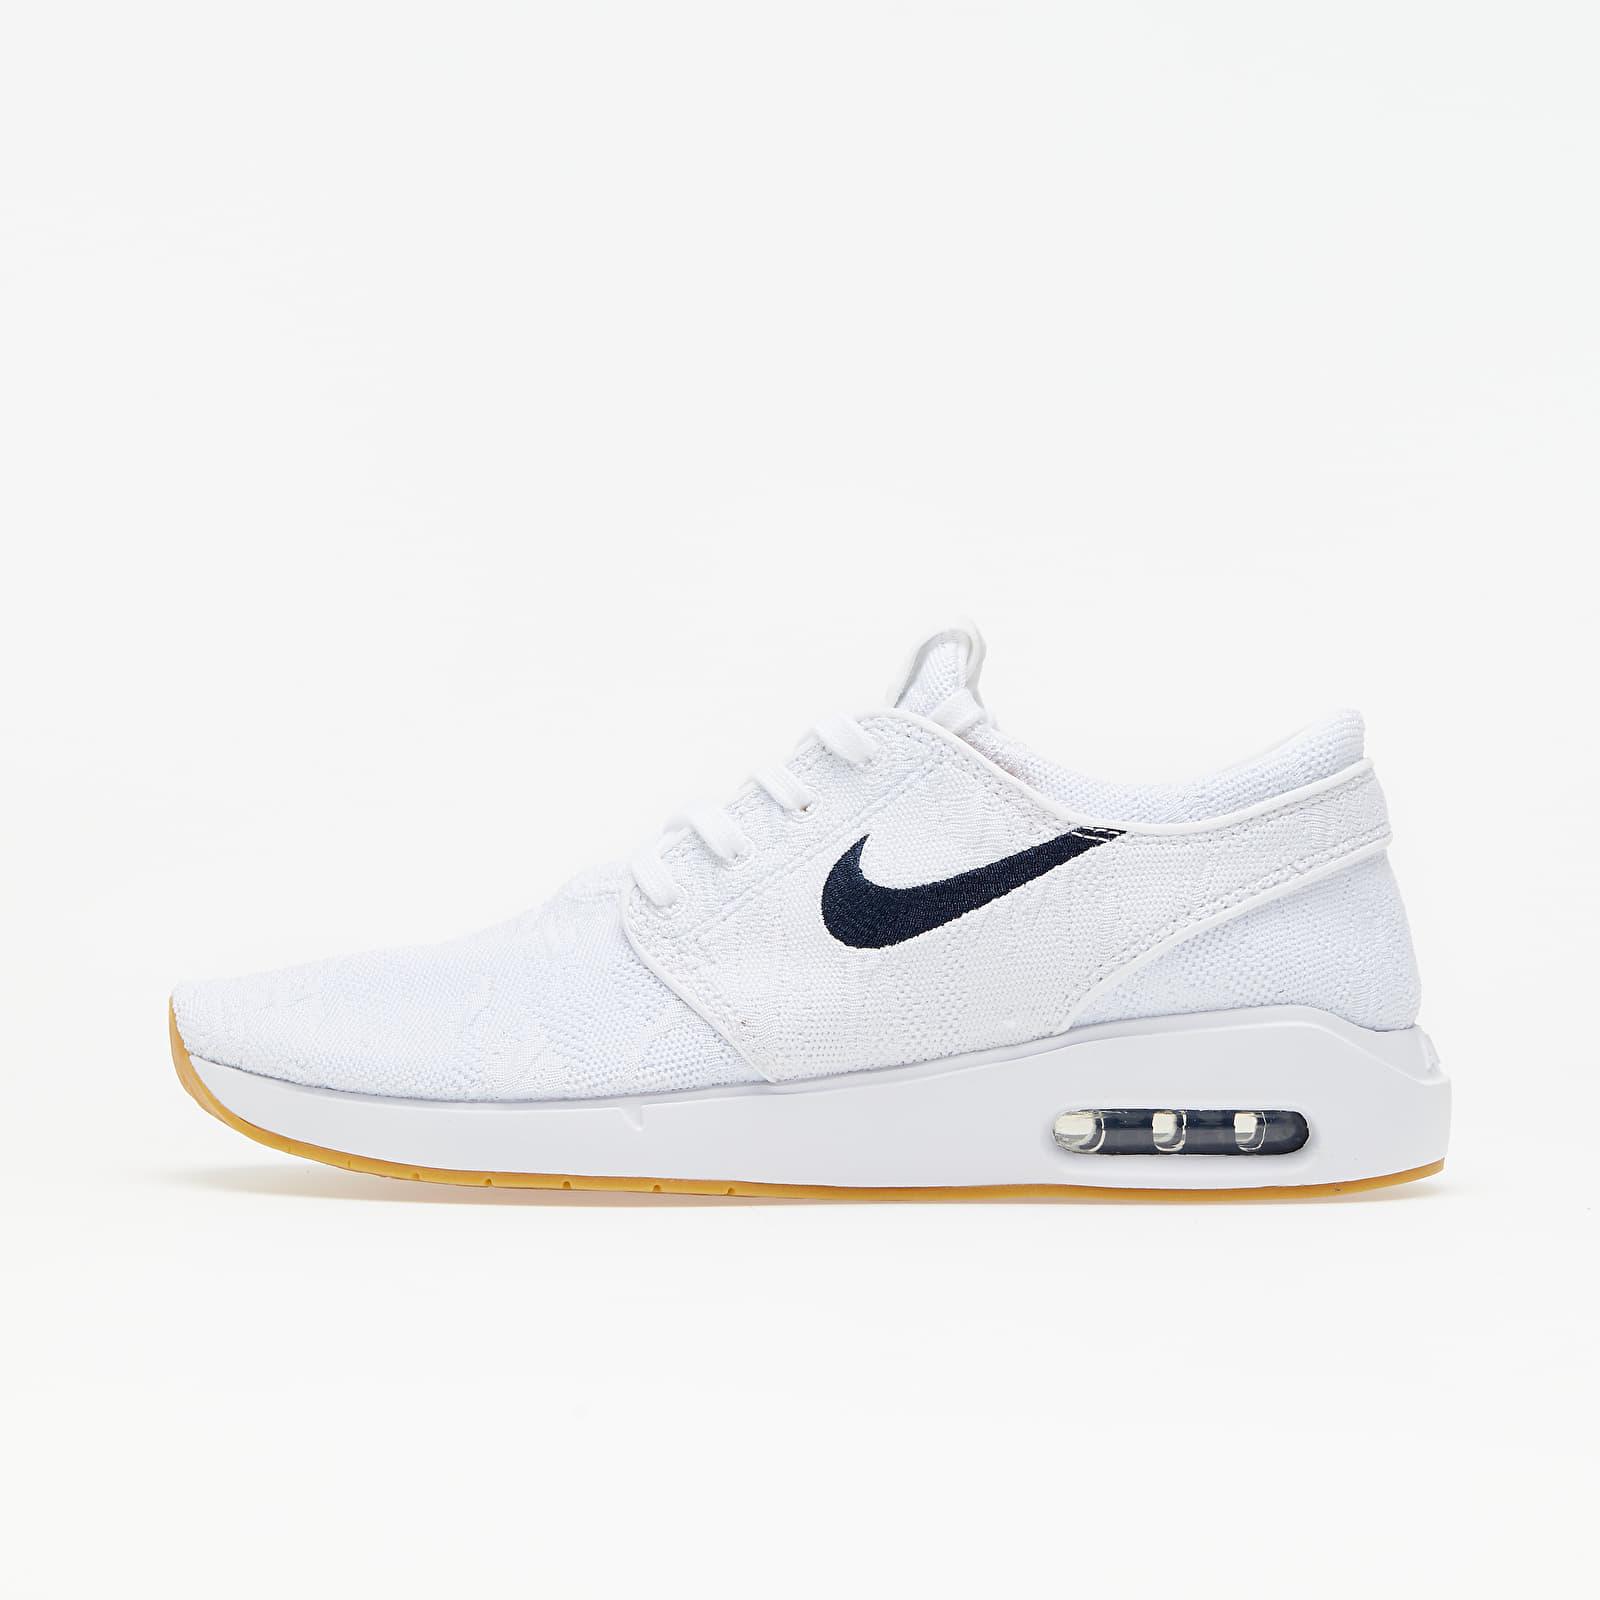 Brillante Melódico Ministerio  Men's shoes Nike SB Air Max Stefan Janoski 2 White/ Obsidian-Celestial Gold  | Footshop